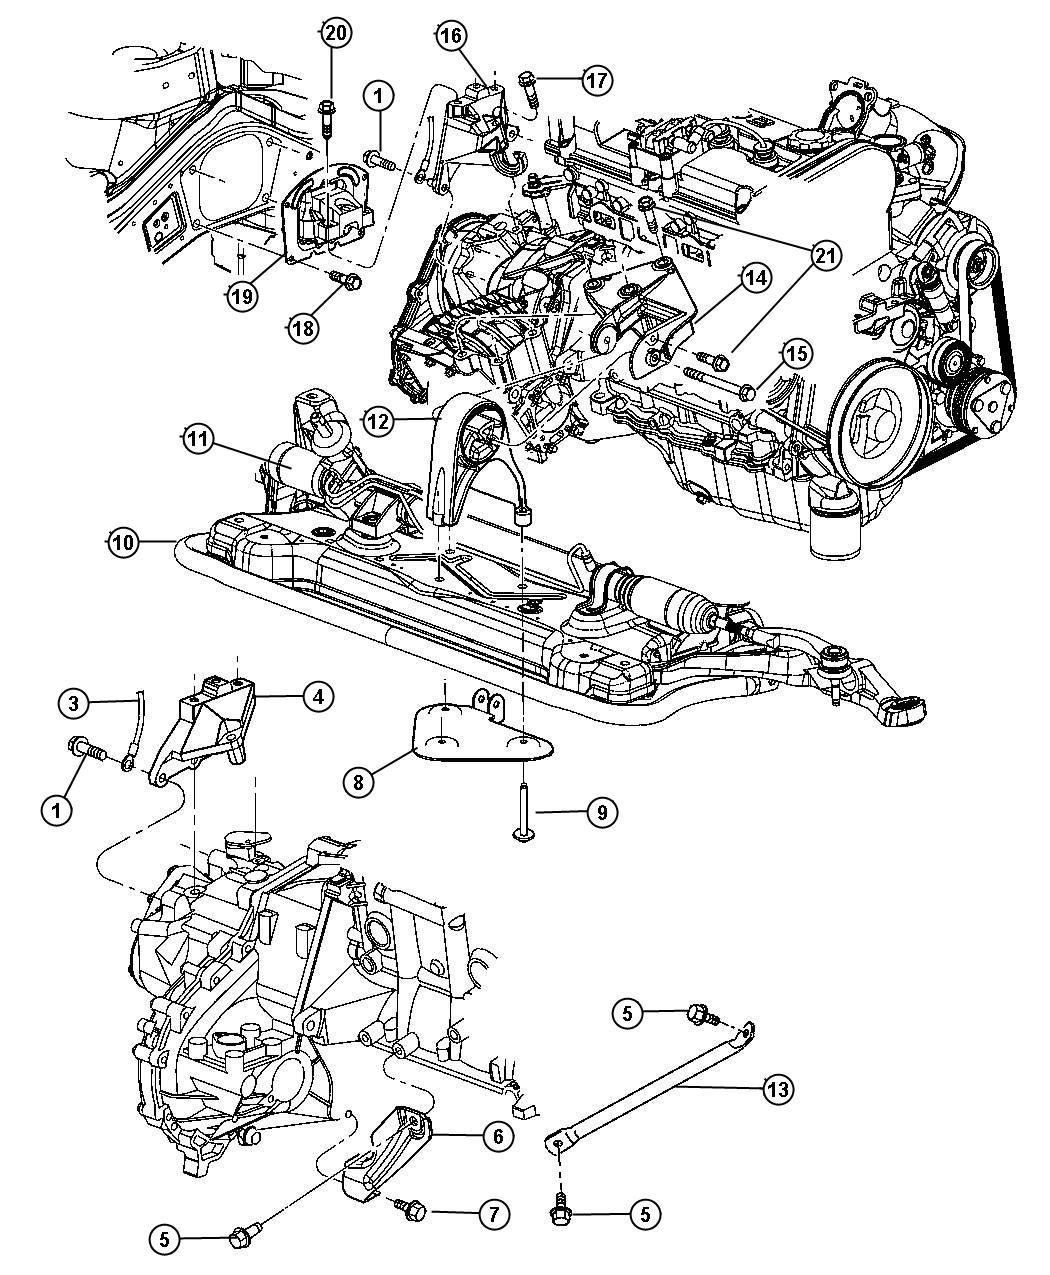 2001 Dodge Stratus Bracket  Torque Reaction  Engine